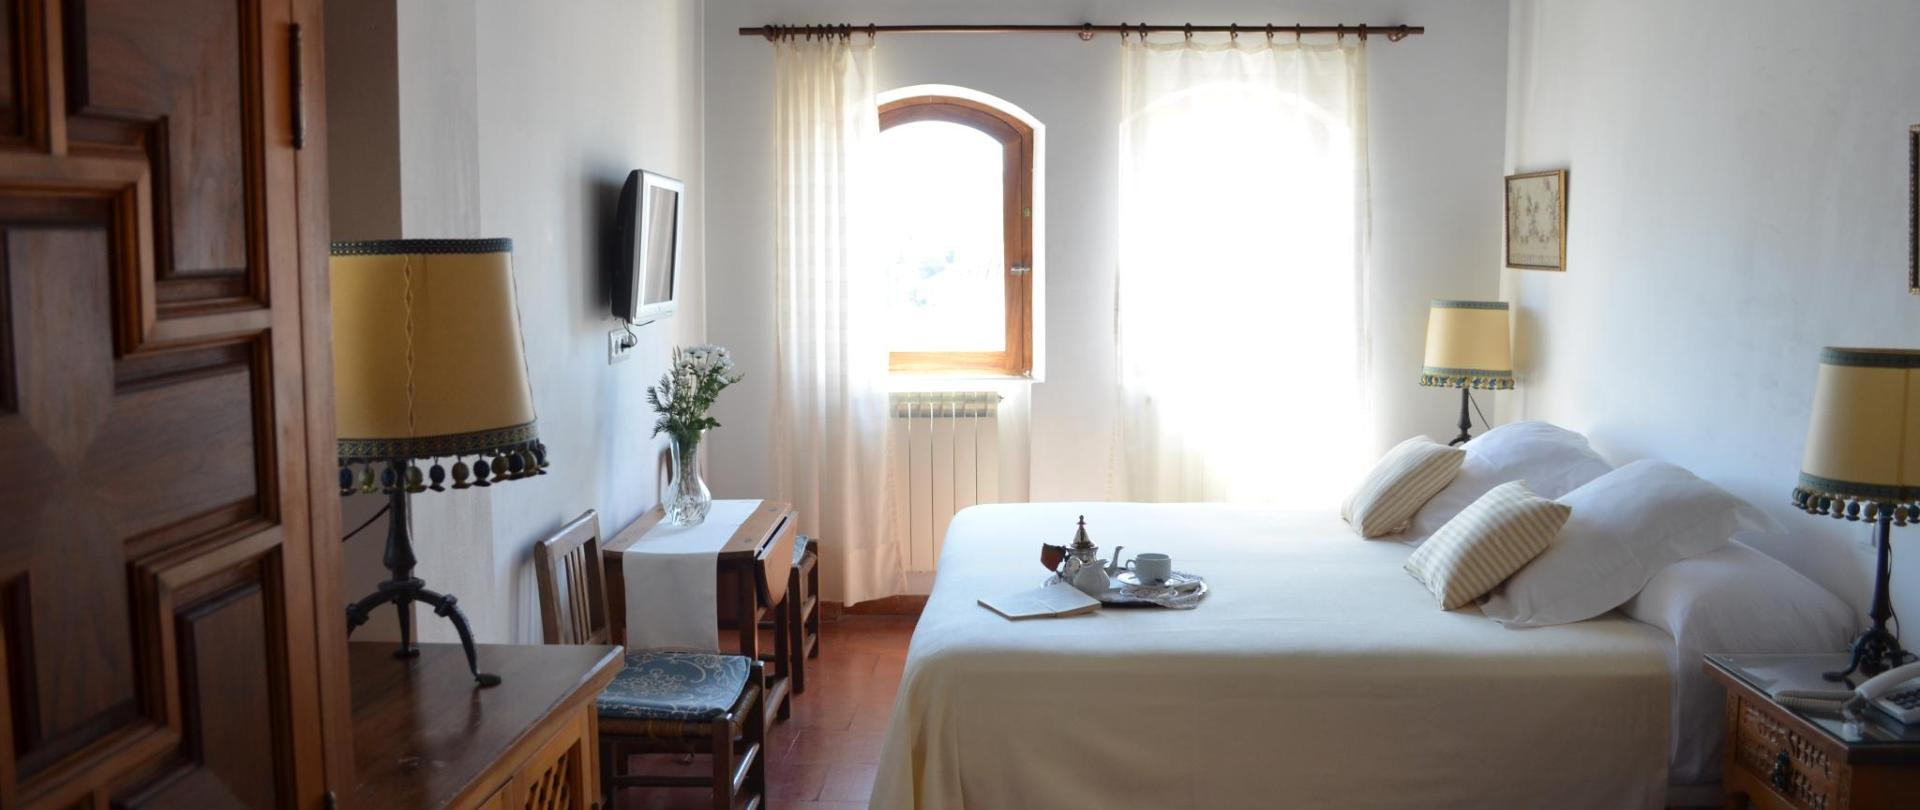 habitacion11 - cama matrimonio.JPG